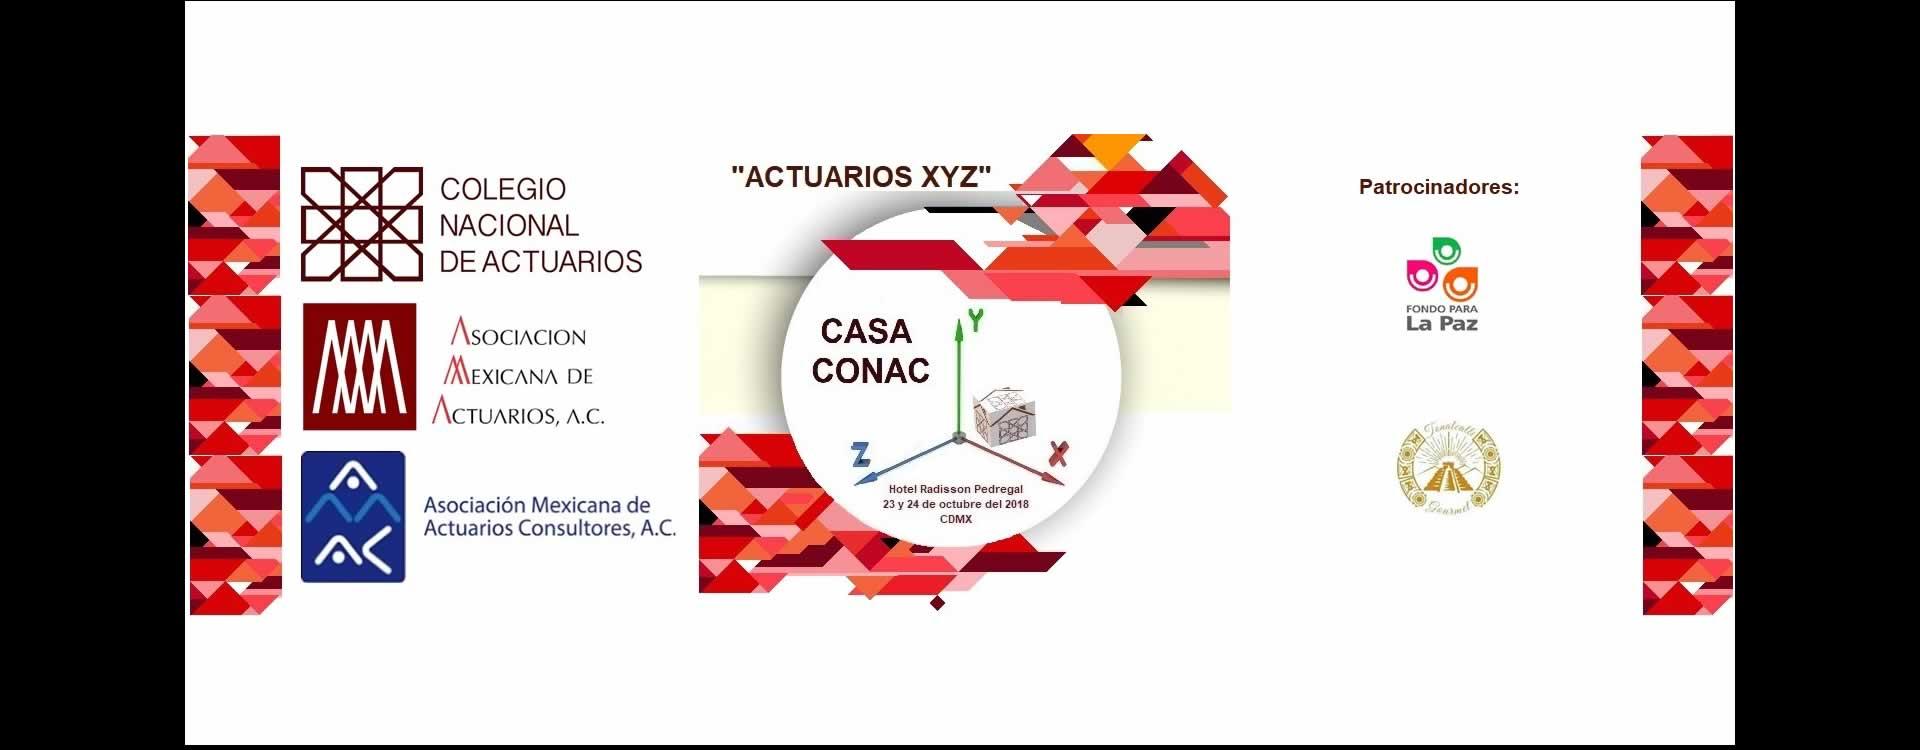 Banner-CASACONAC-02